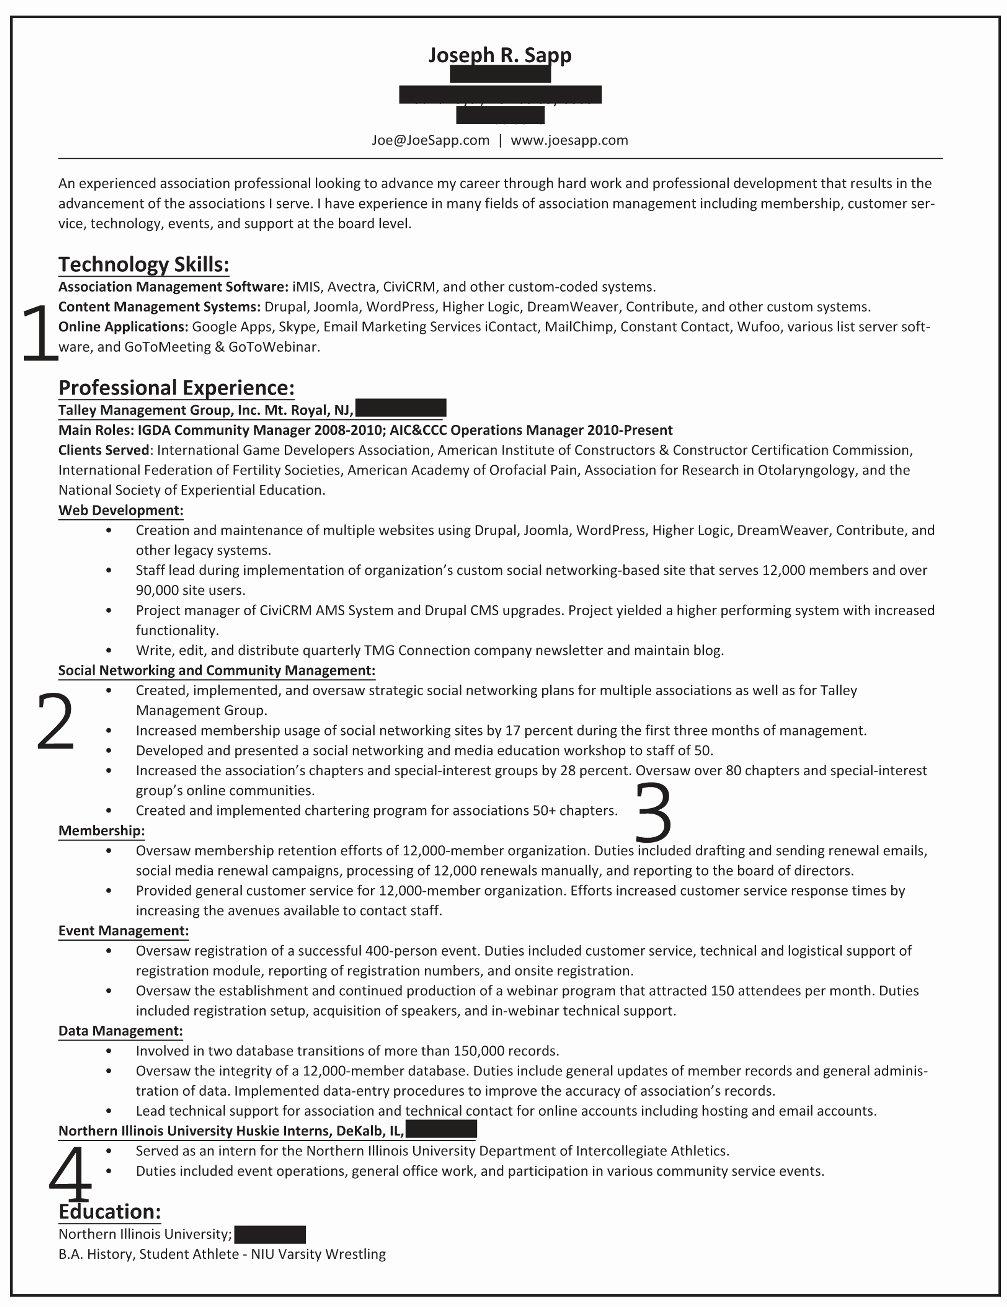 Marketing Professional Resume Summary